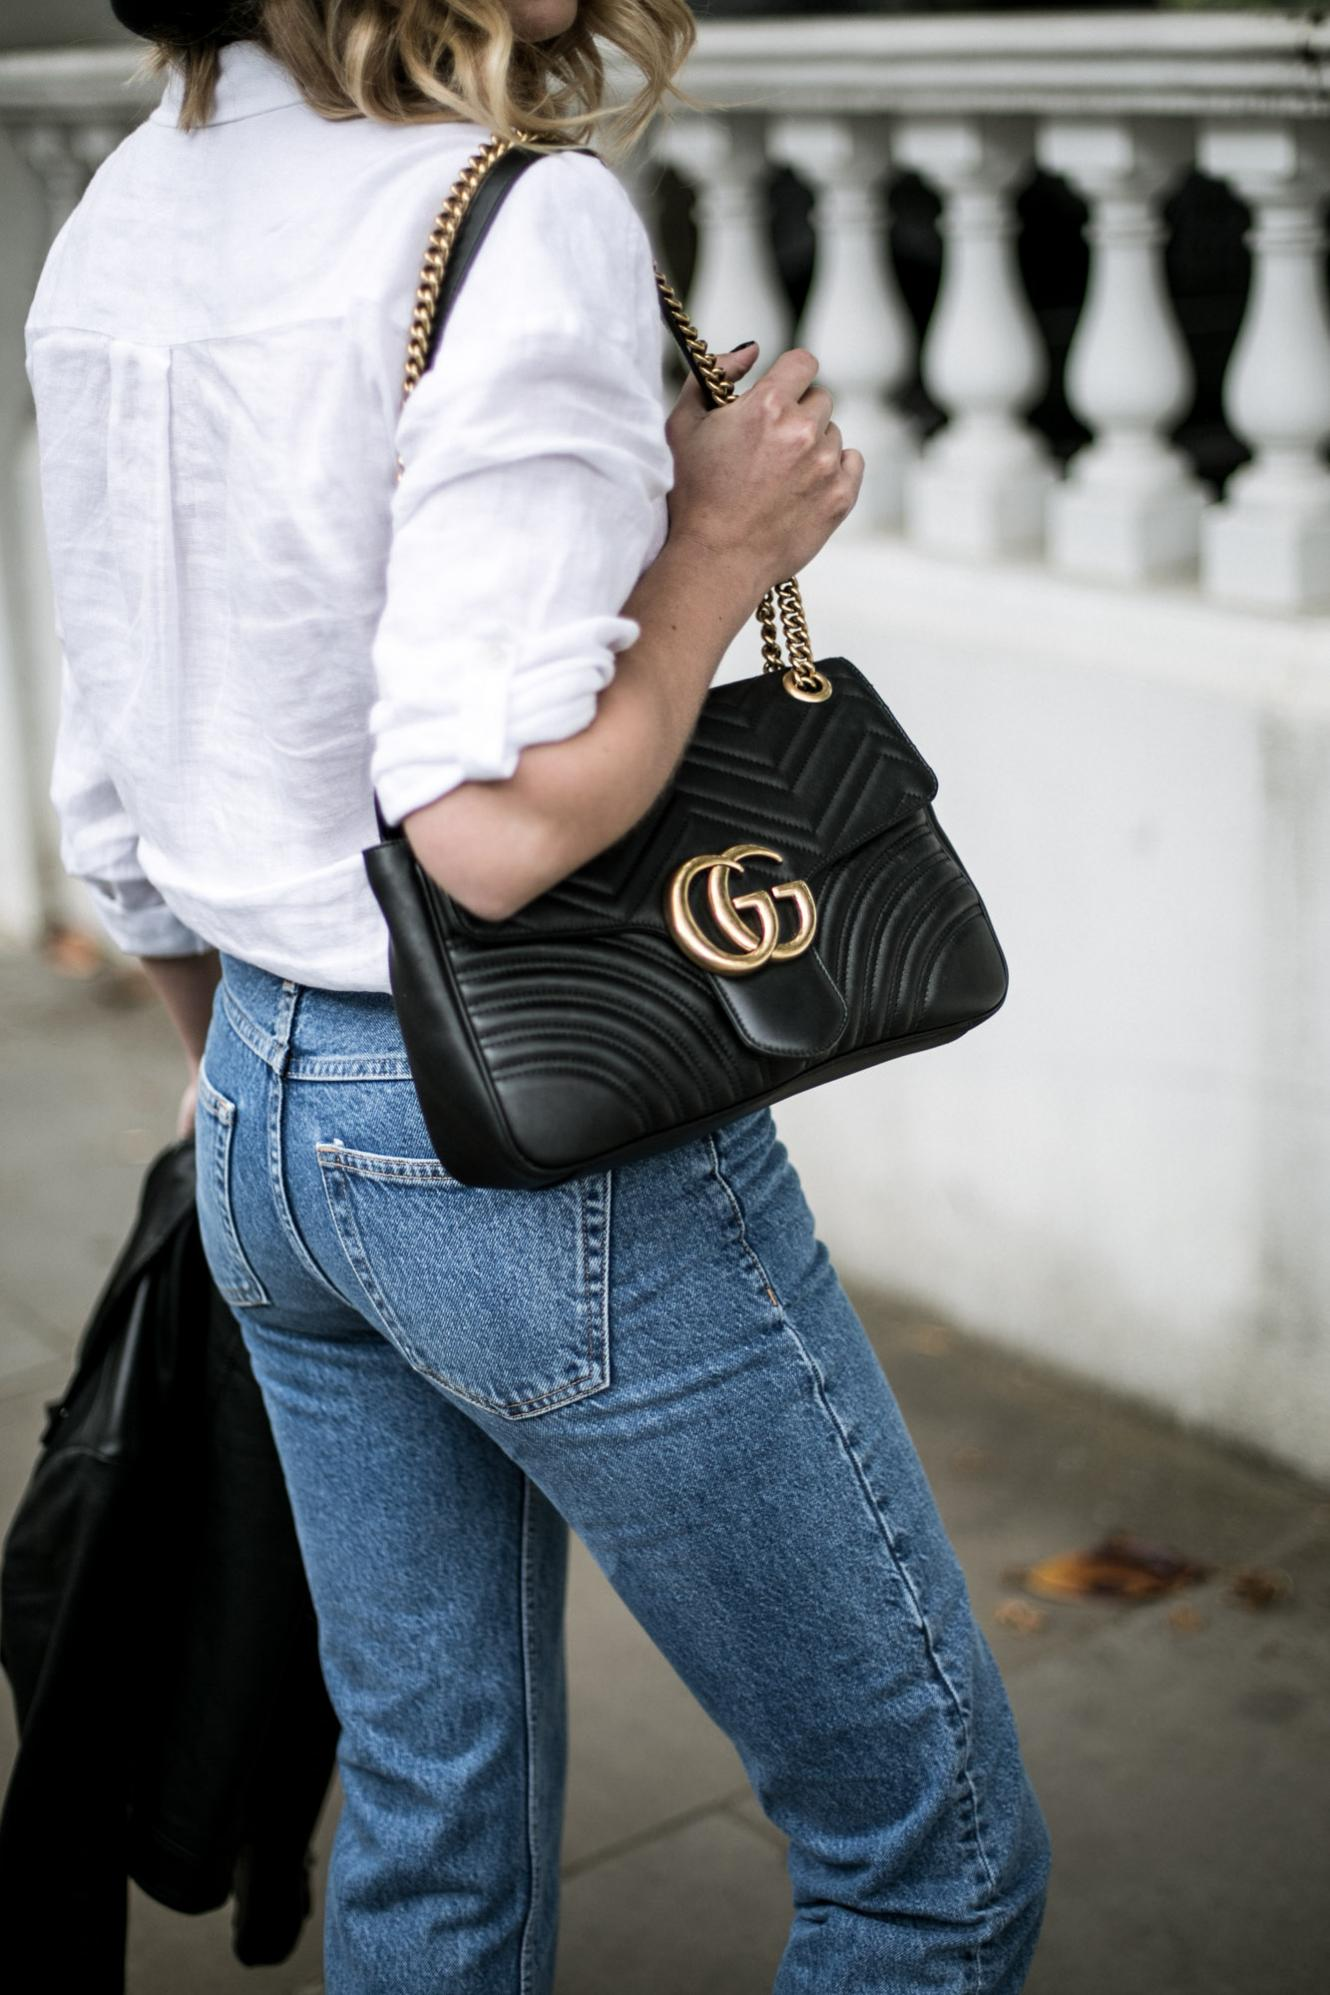 gucci black leather marmot bag, white linen shirt, jeans, biker jacket